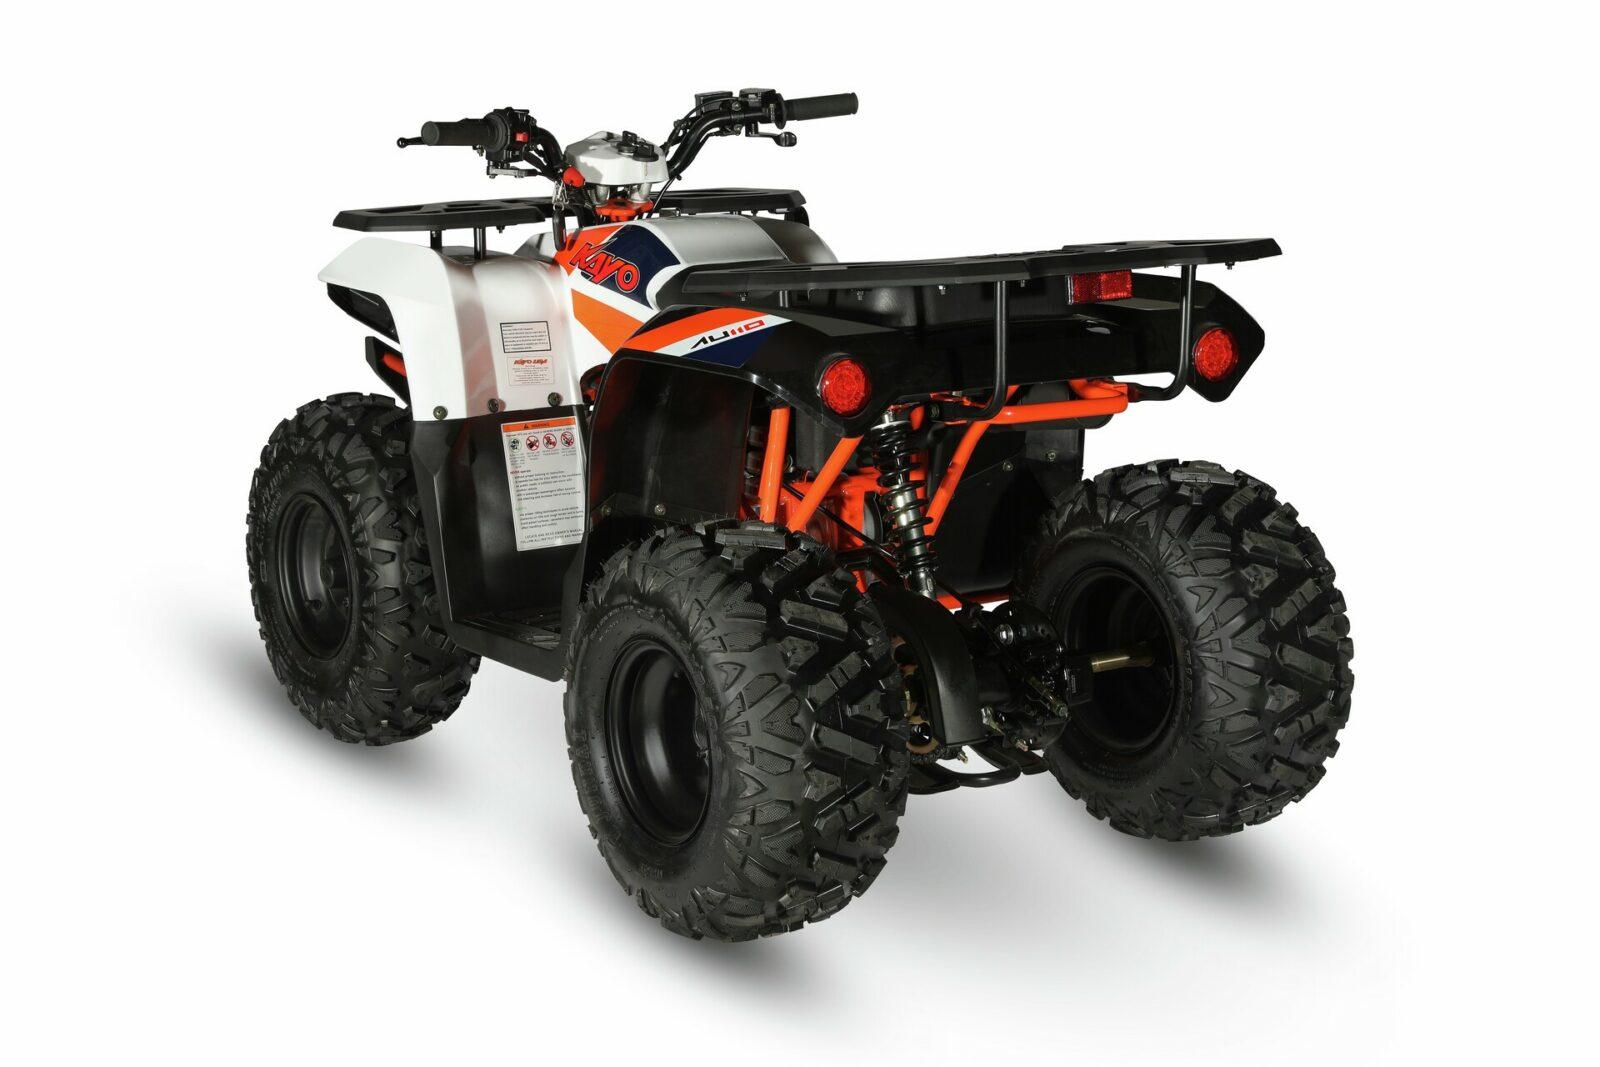 KAYO AU110 ATV 01931 1920